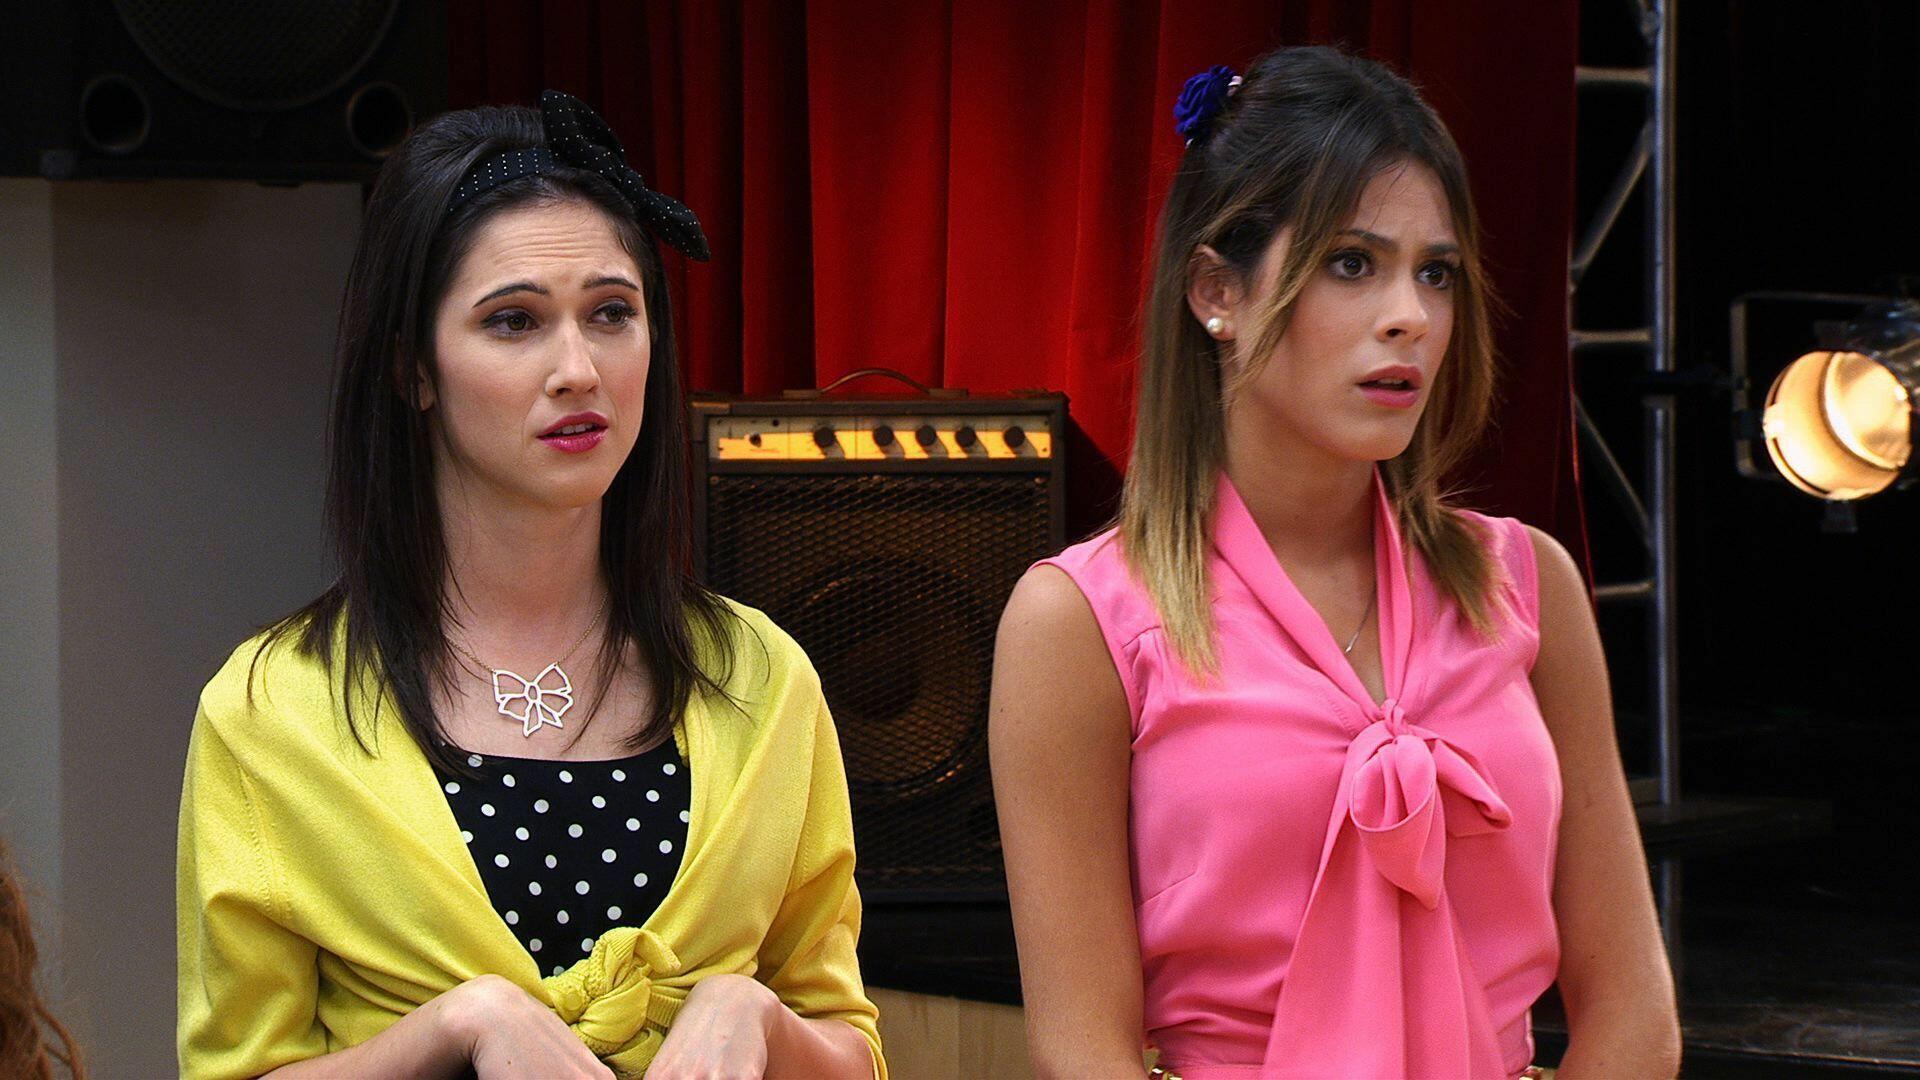 Violetta Staffel 2 Disney Plus